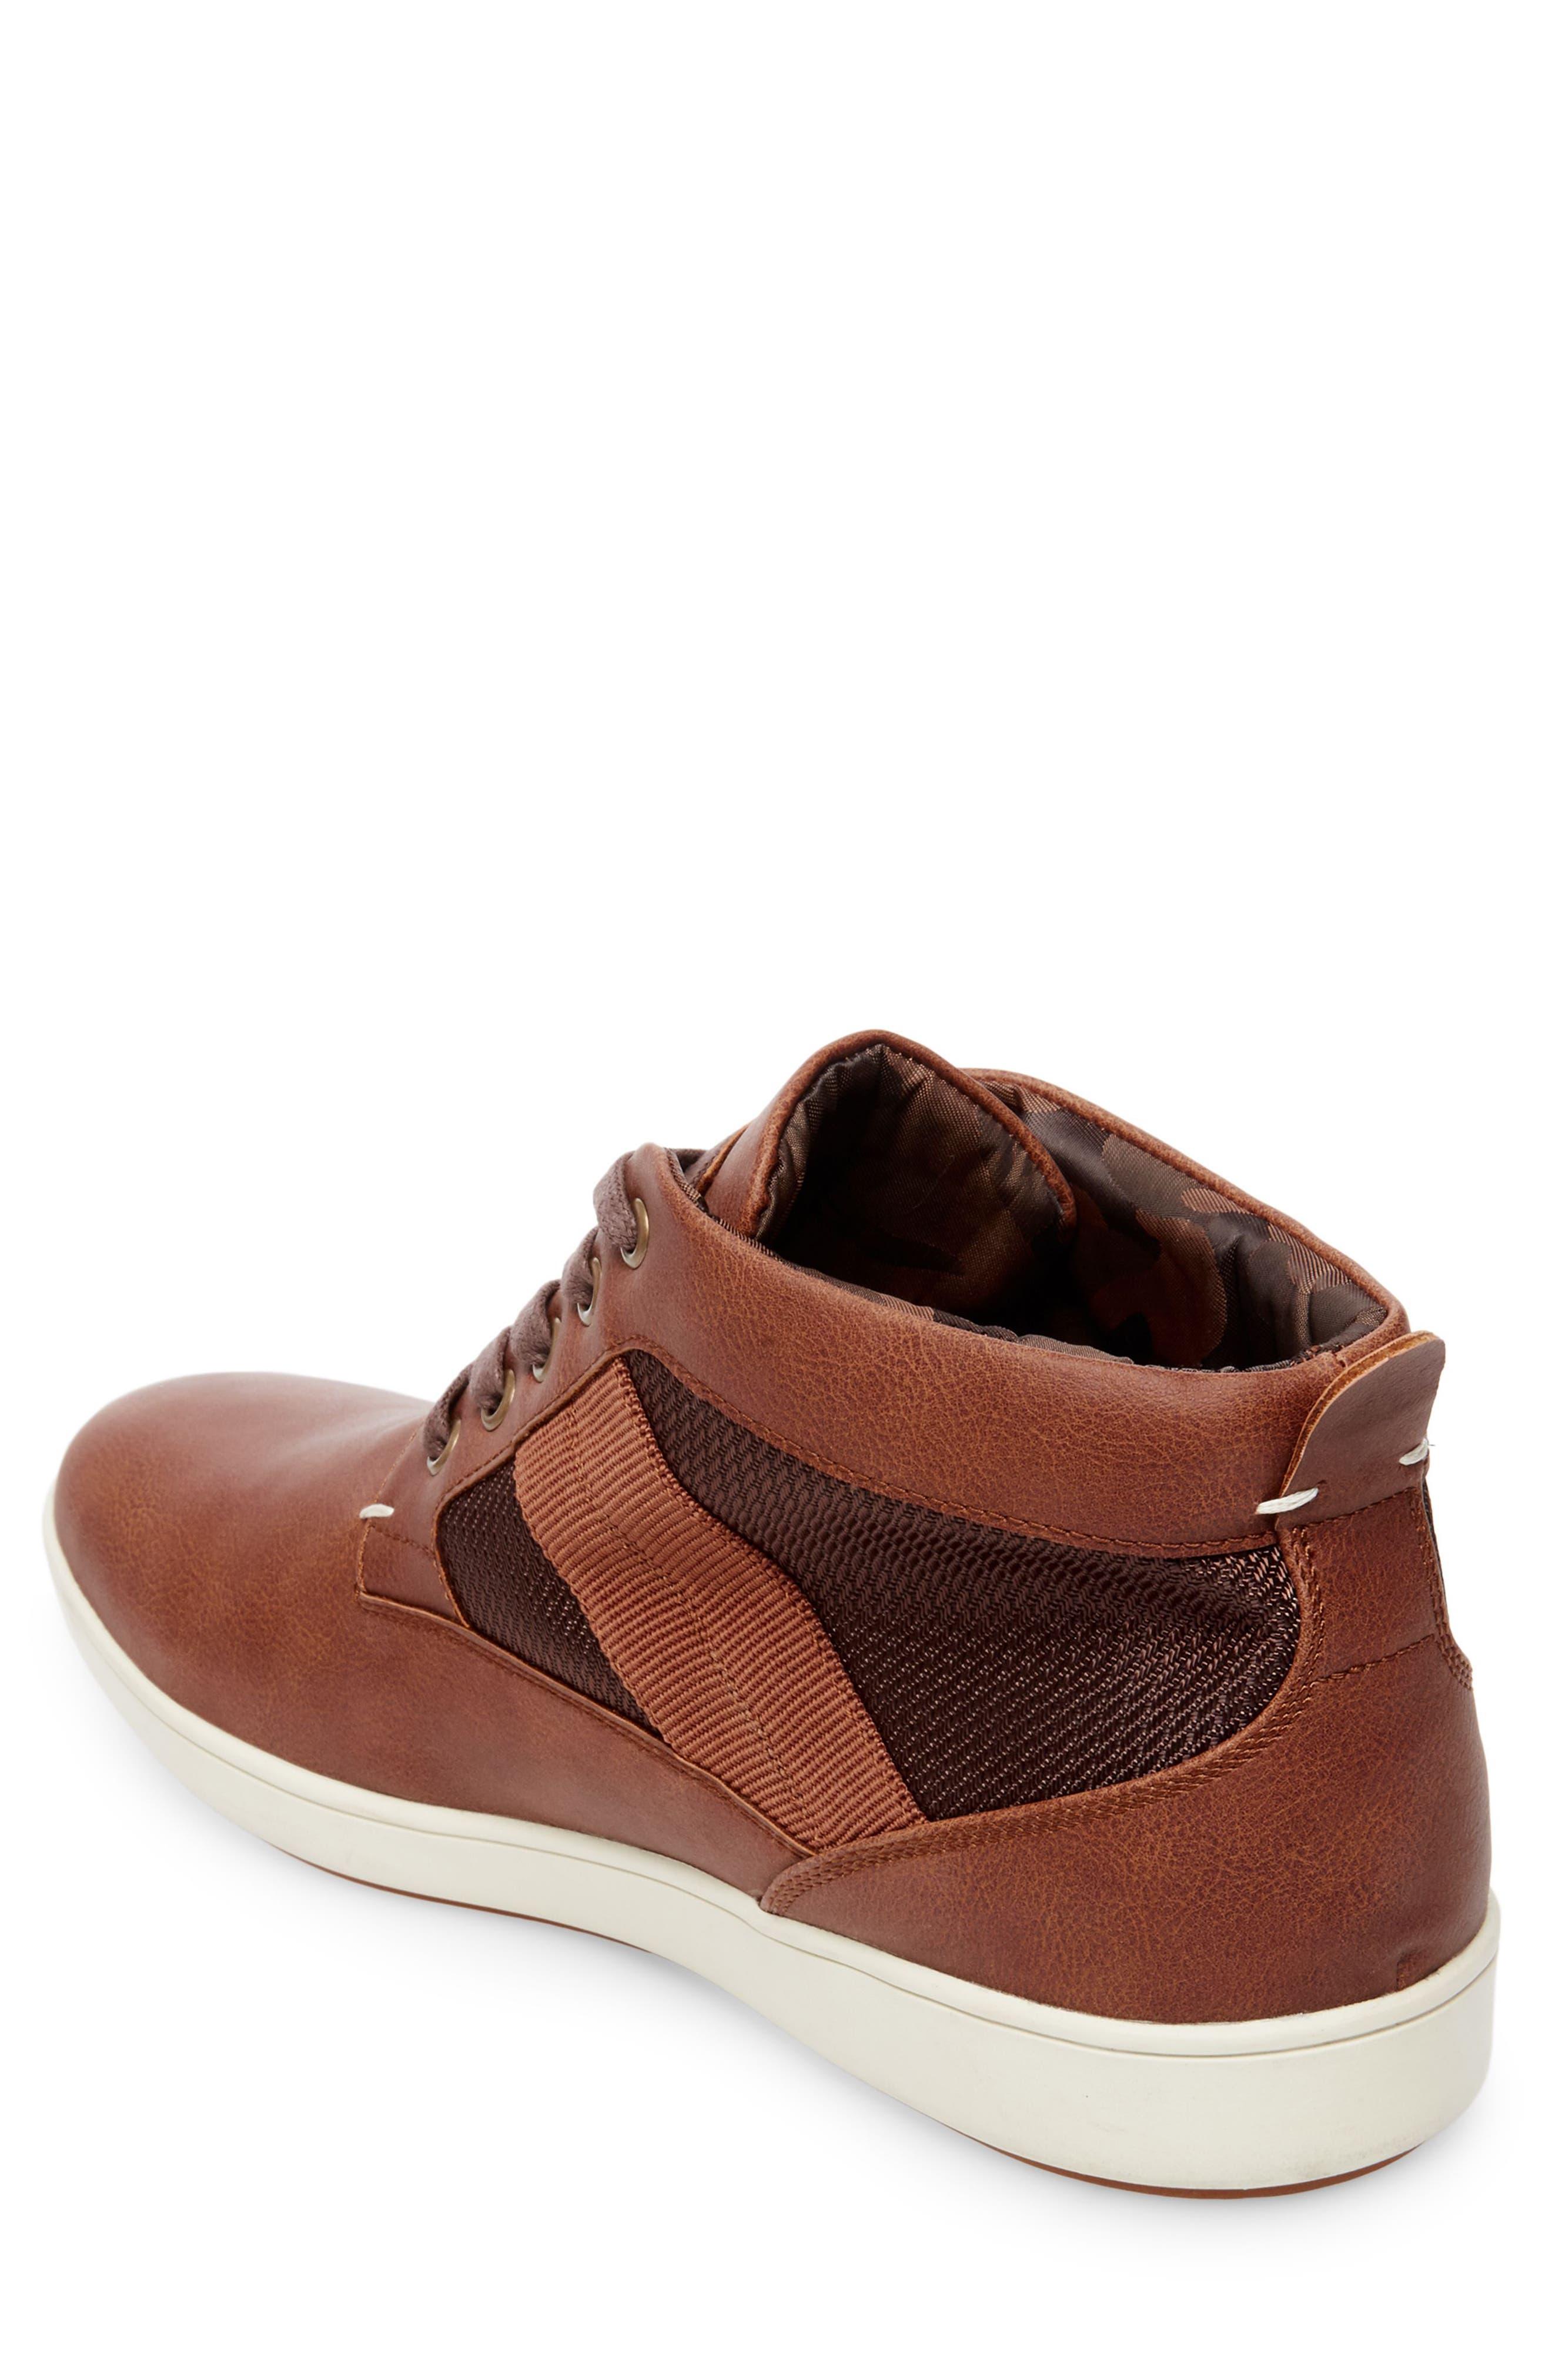 Frazier Sneaker Boot,                             Alternate thumbnail 2, color,                             Cognac